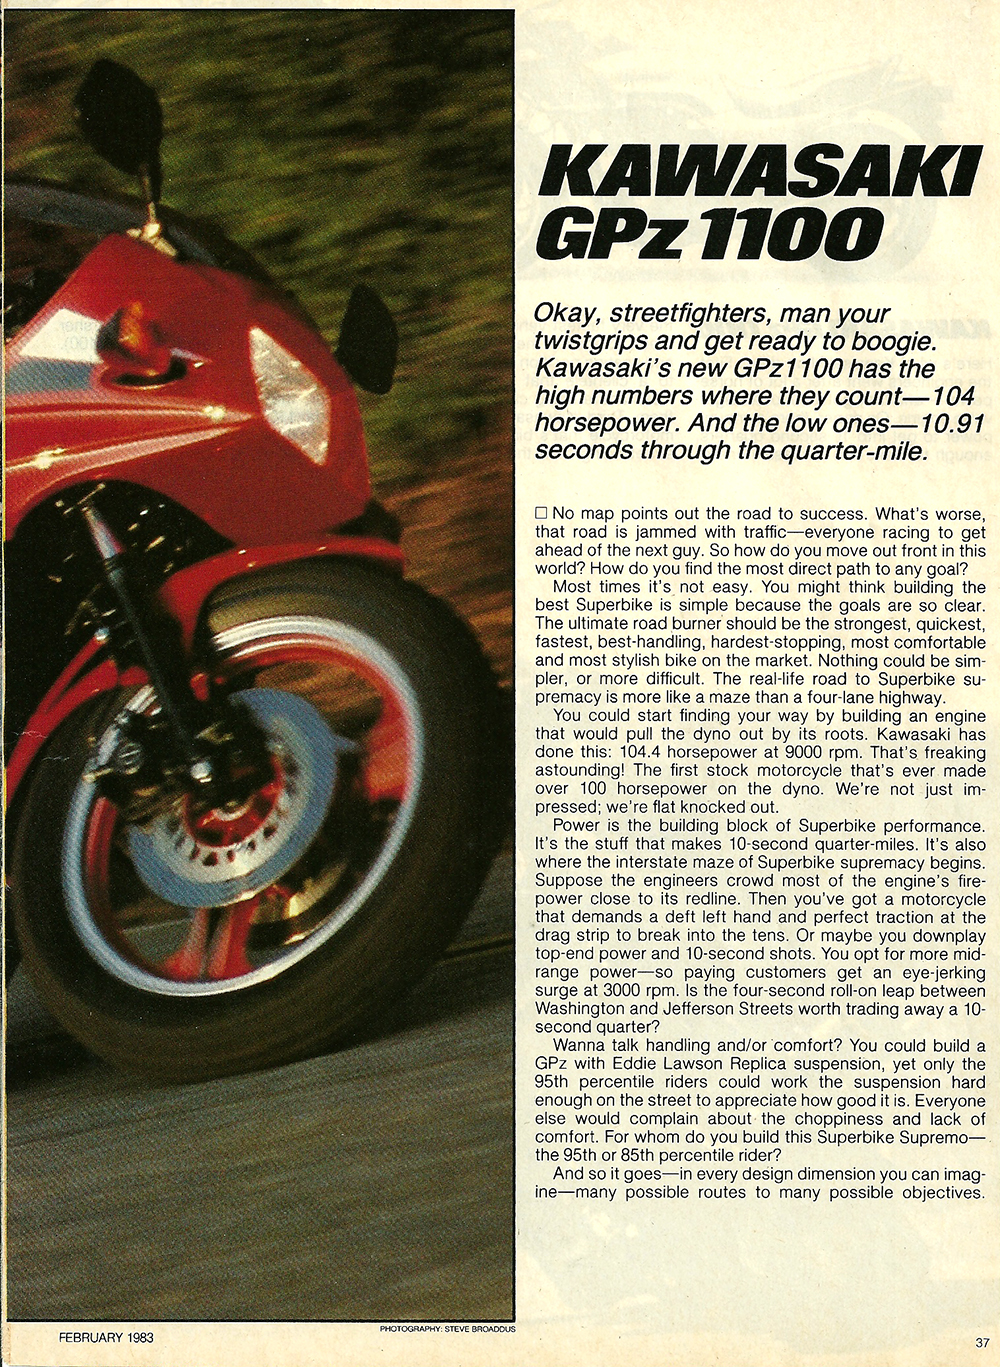 1983 Kawasaki GPz1100 road test 2.jpg